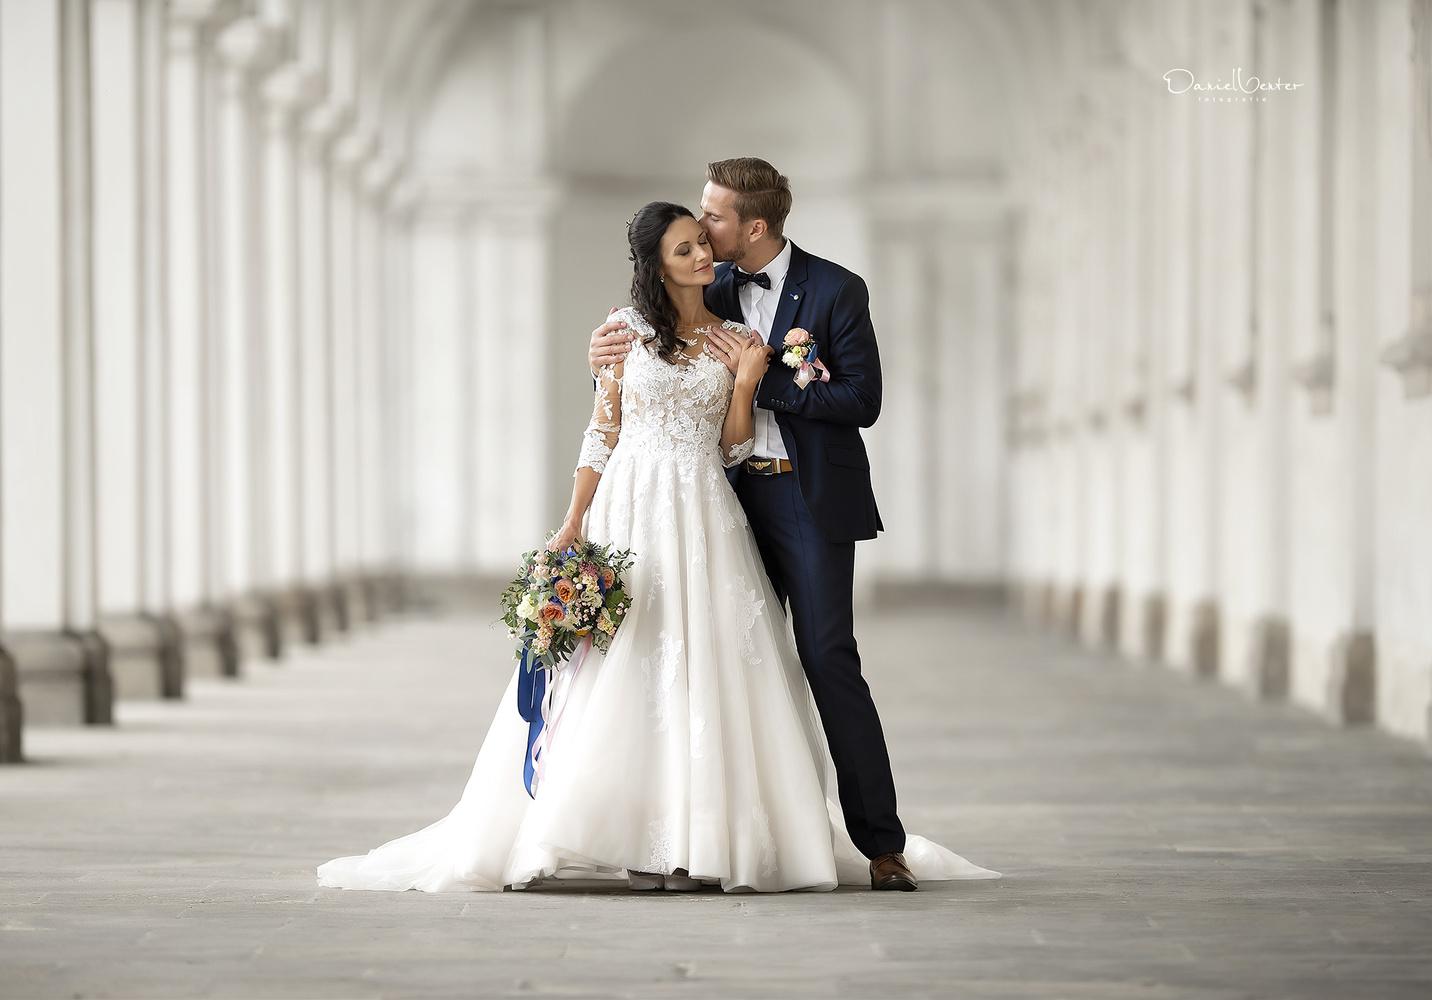 Archway Romance by Daniel Venter